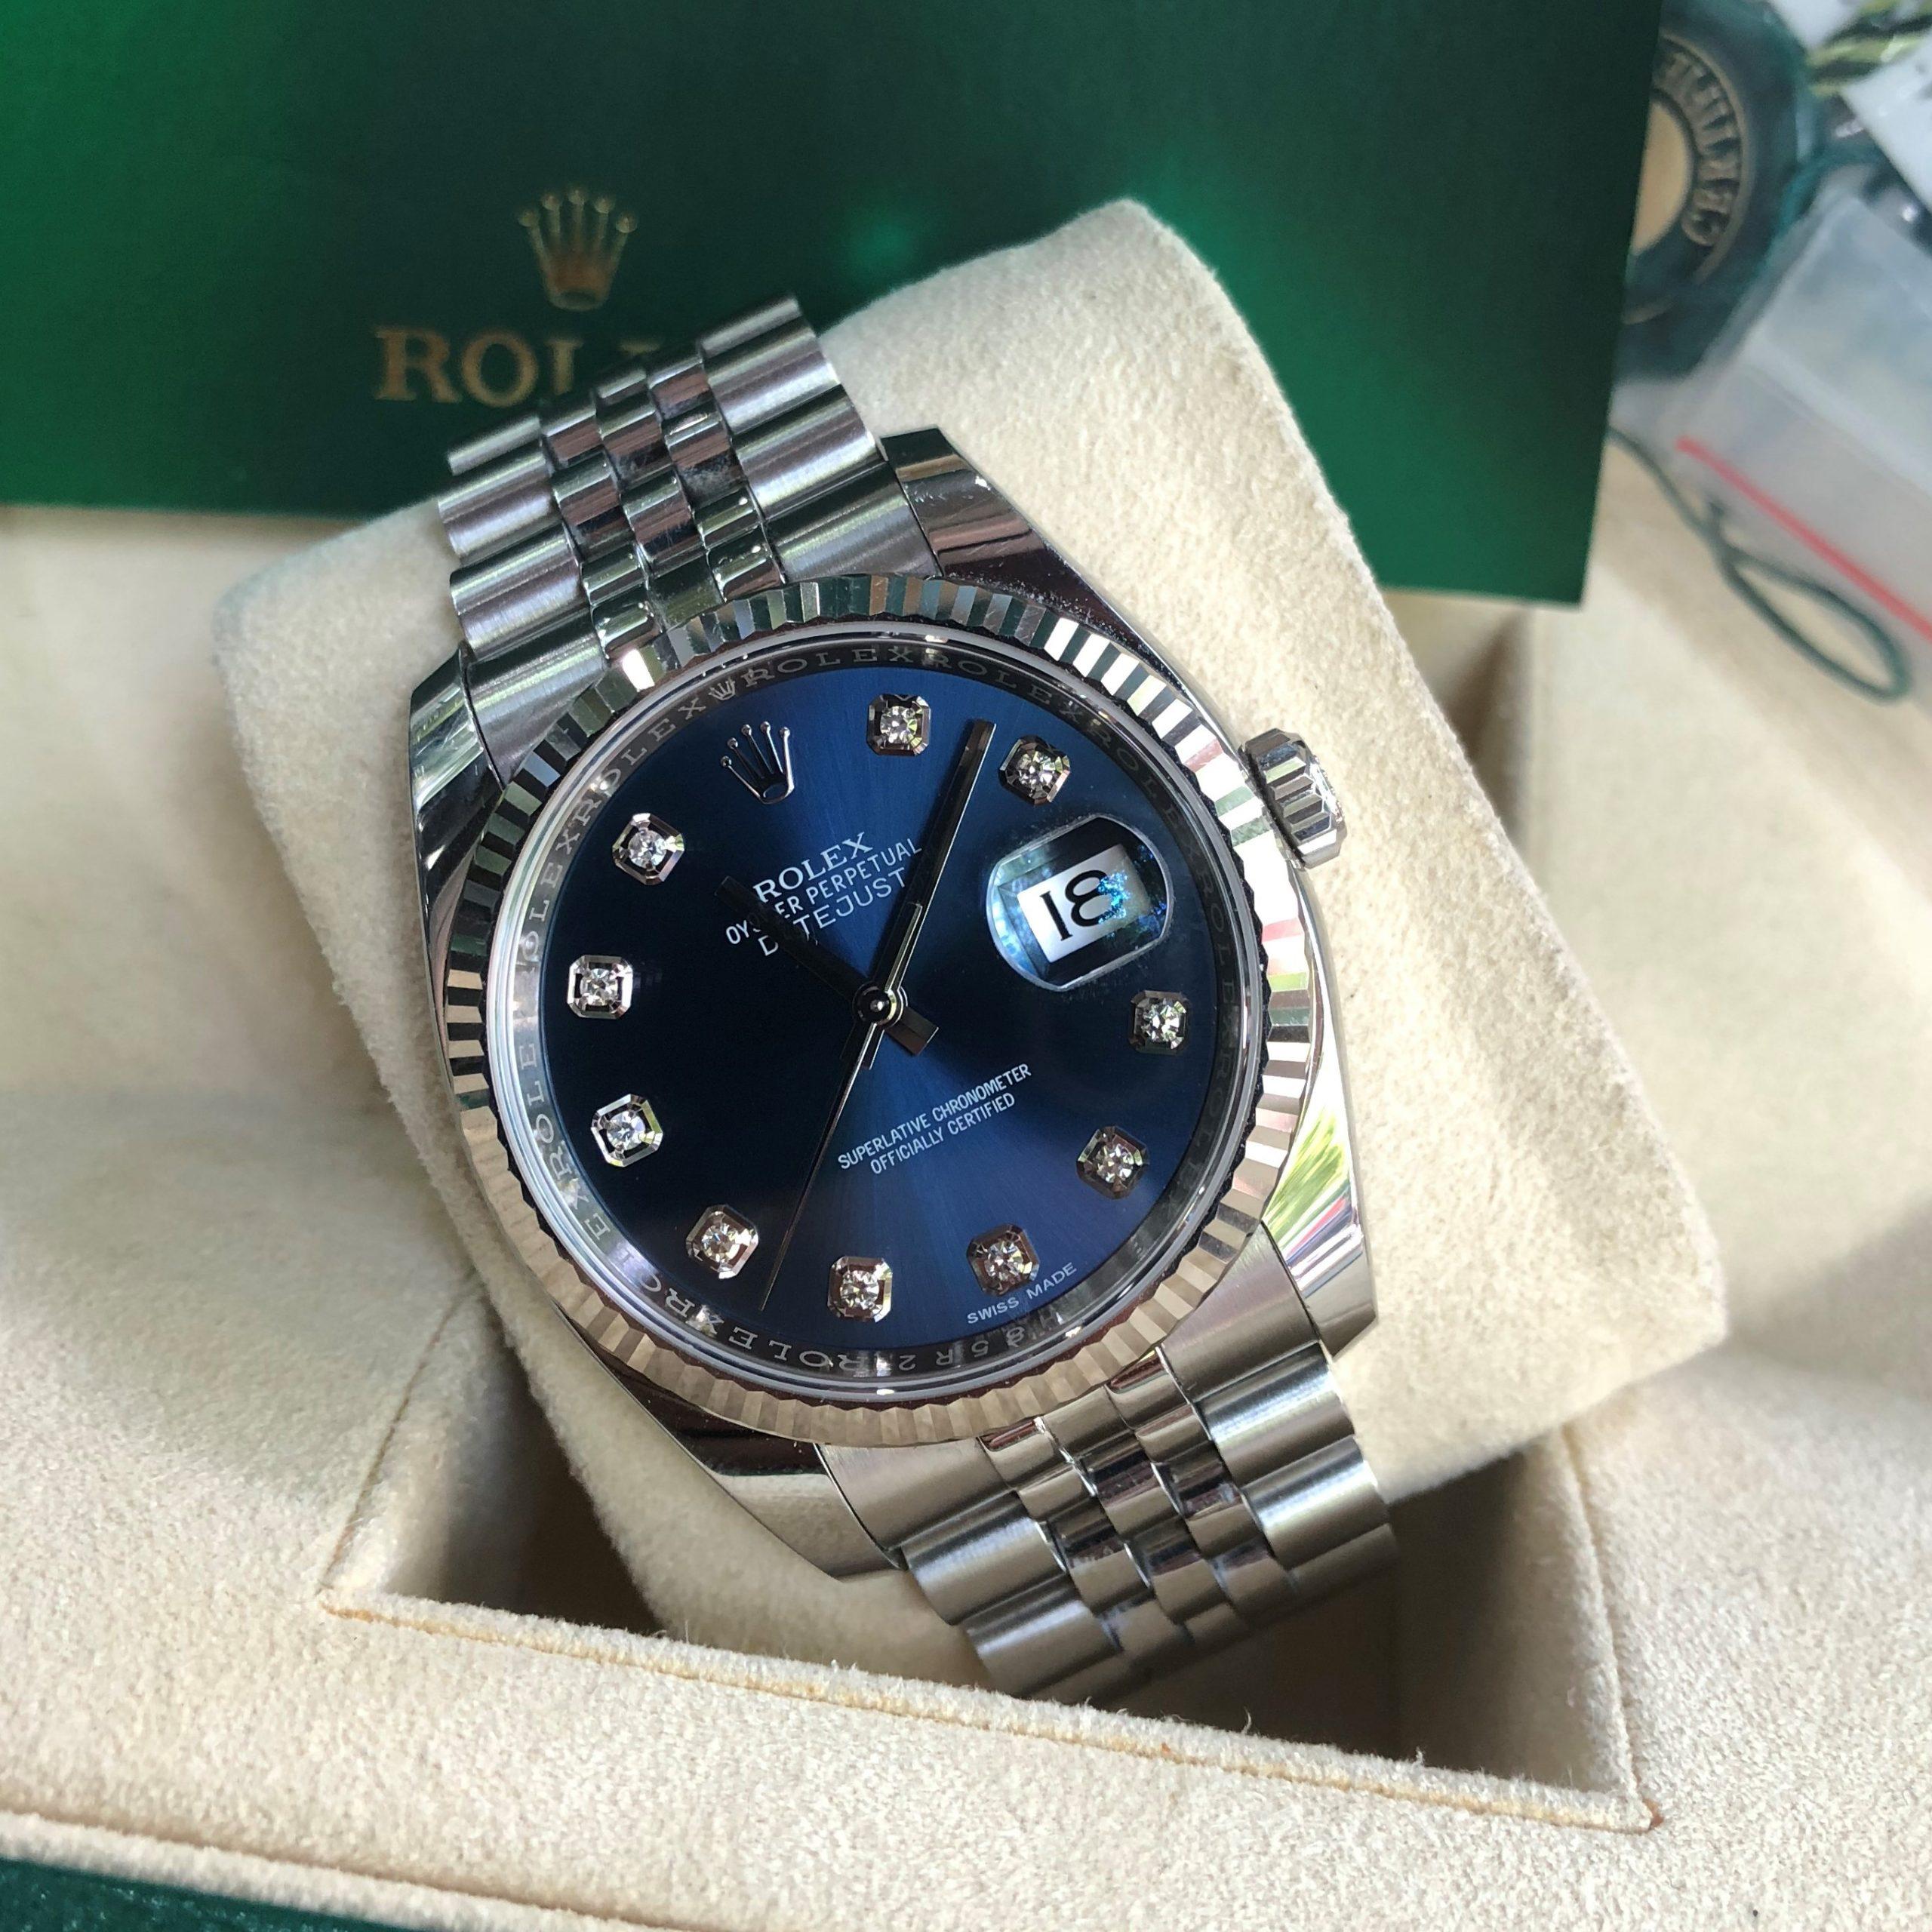 Rolex 116234 mặt xanh Navy cọc số kim cương fullbox 2016